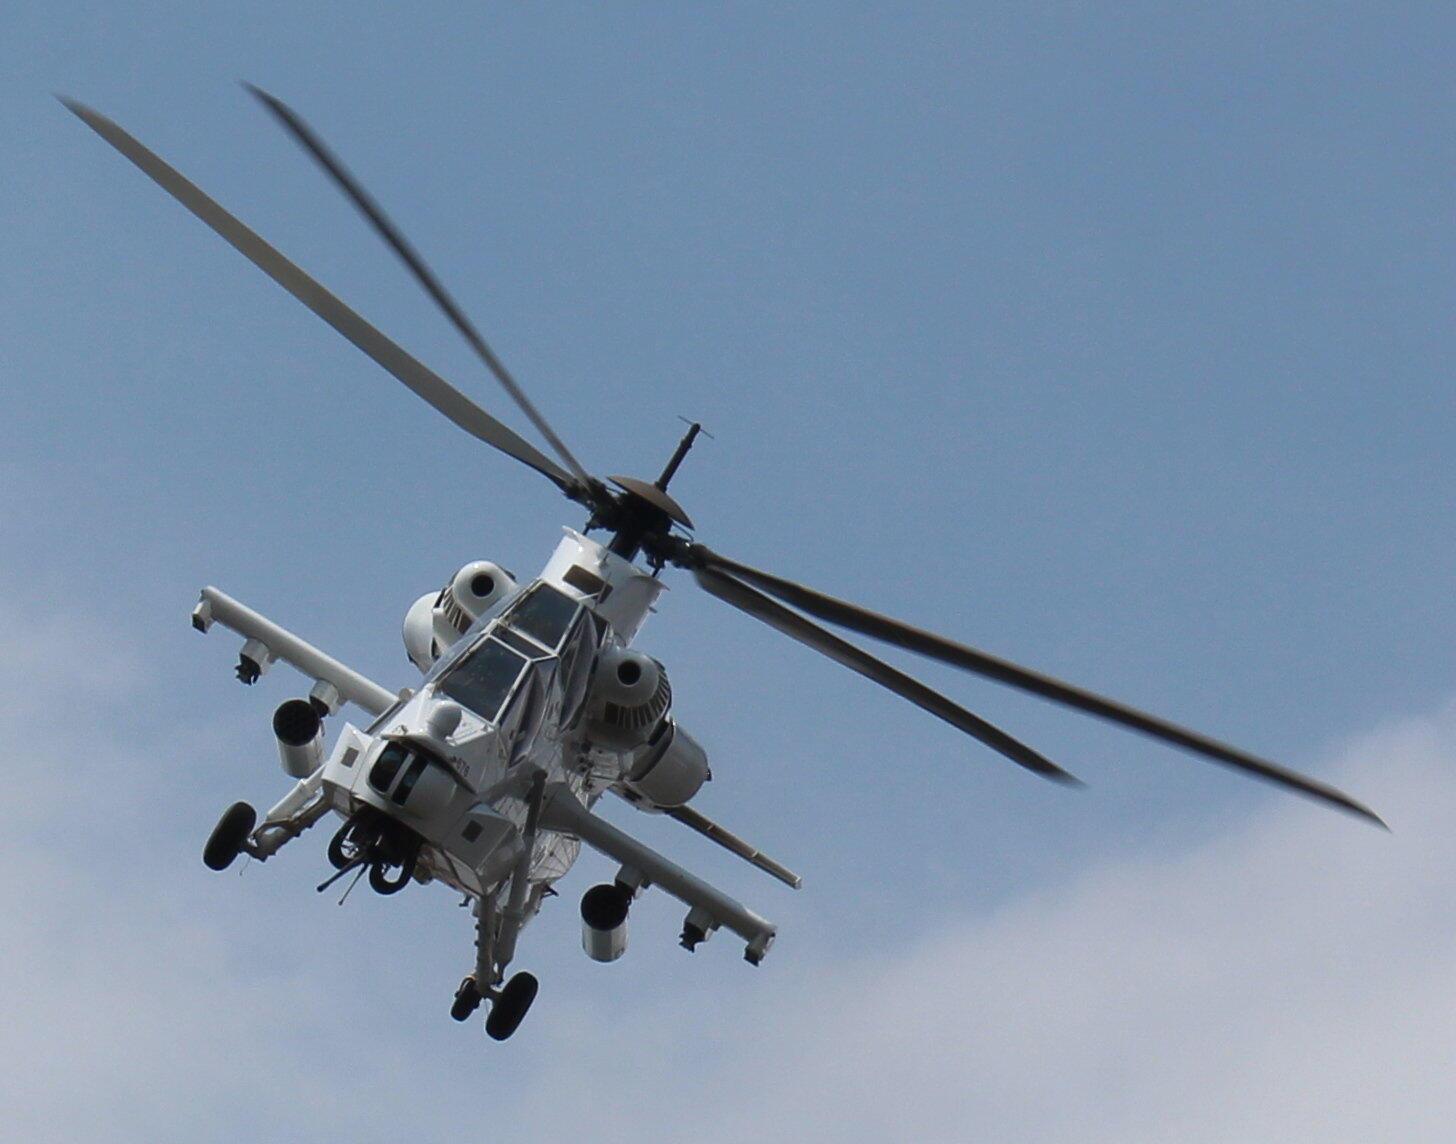 Le Rooivalk, hélicoptère d'attaque du groupe sud africain Denel.